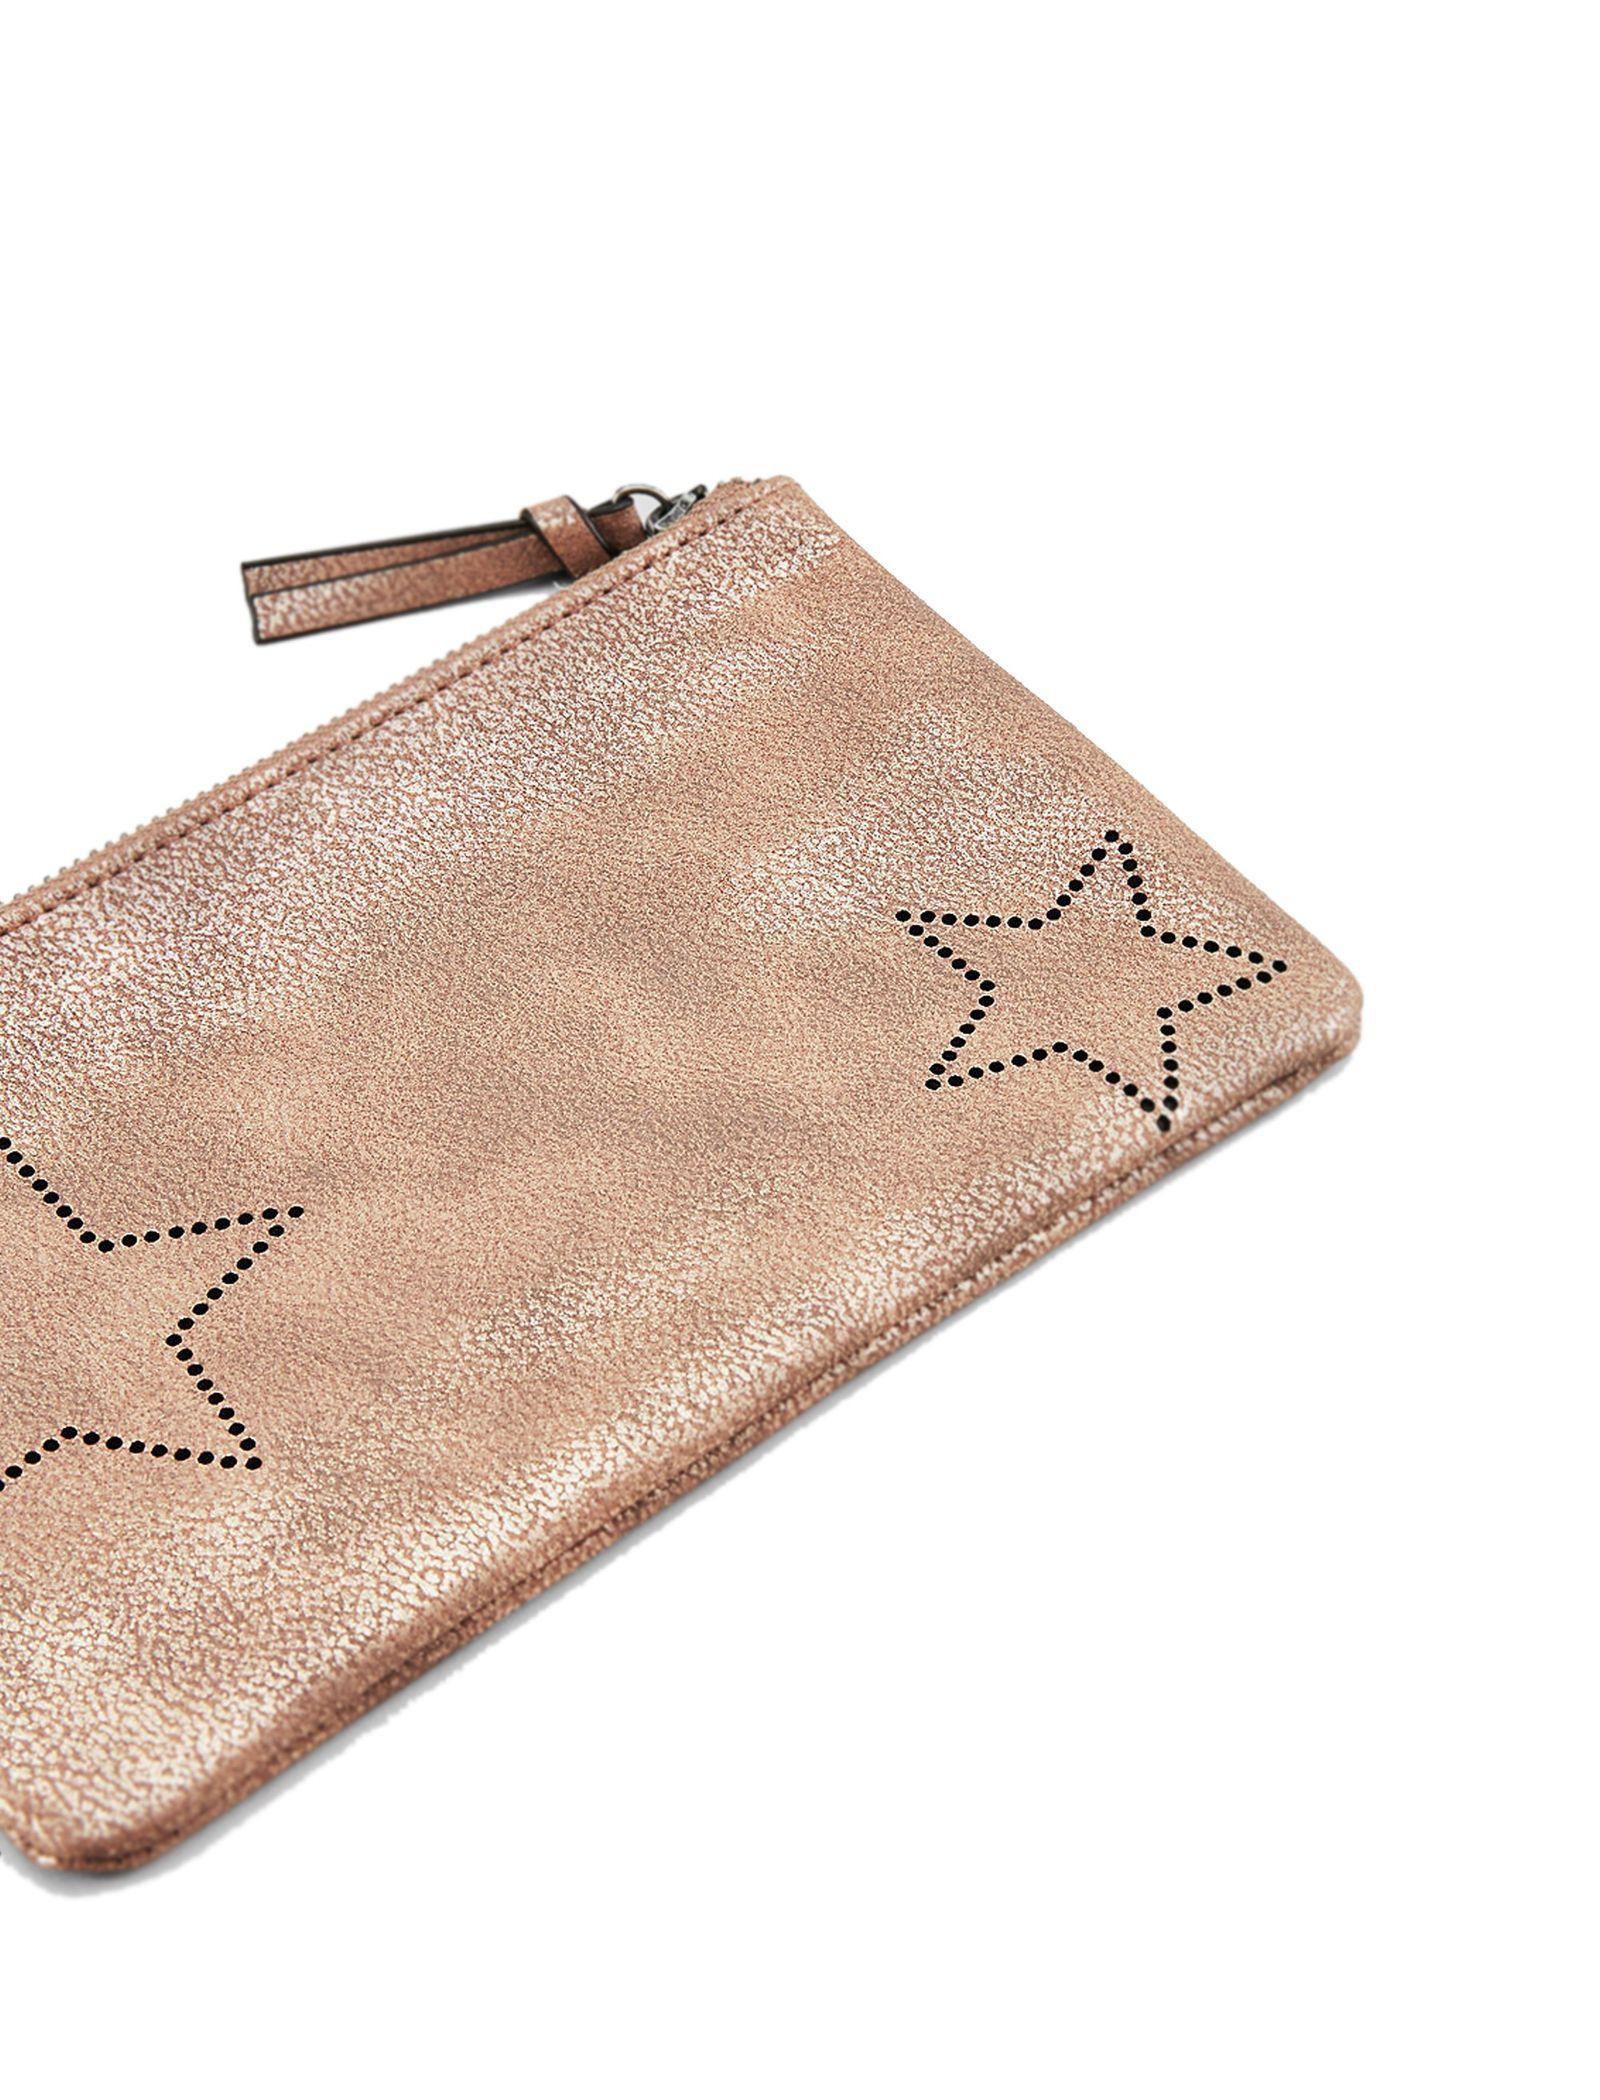 کیف لوازم آرایش زنانه - اس.اولیور - صورتي - 2